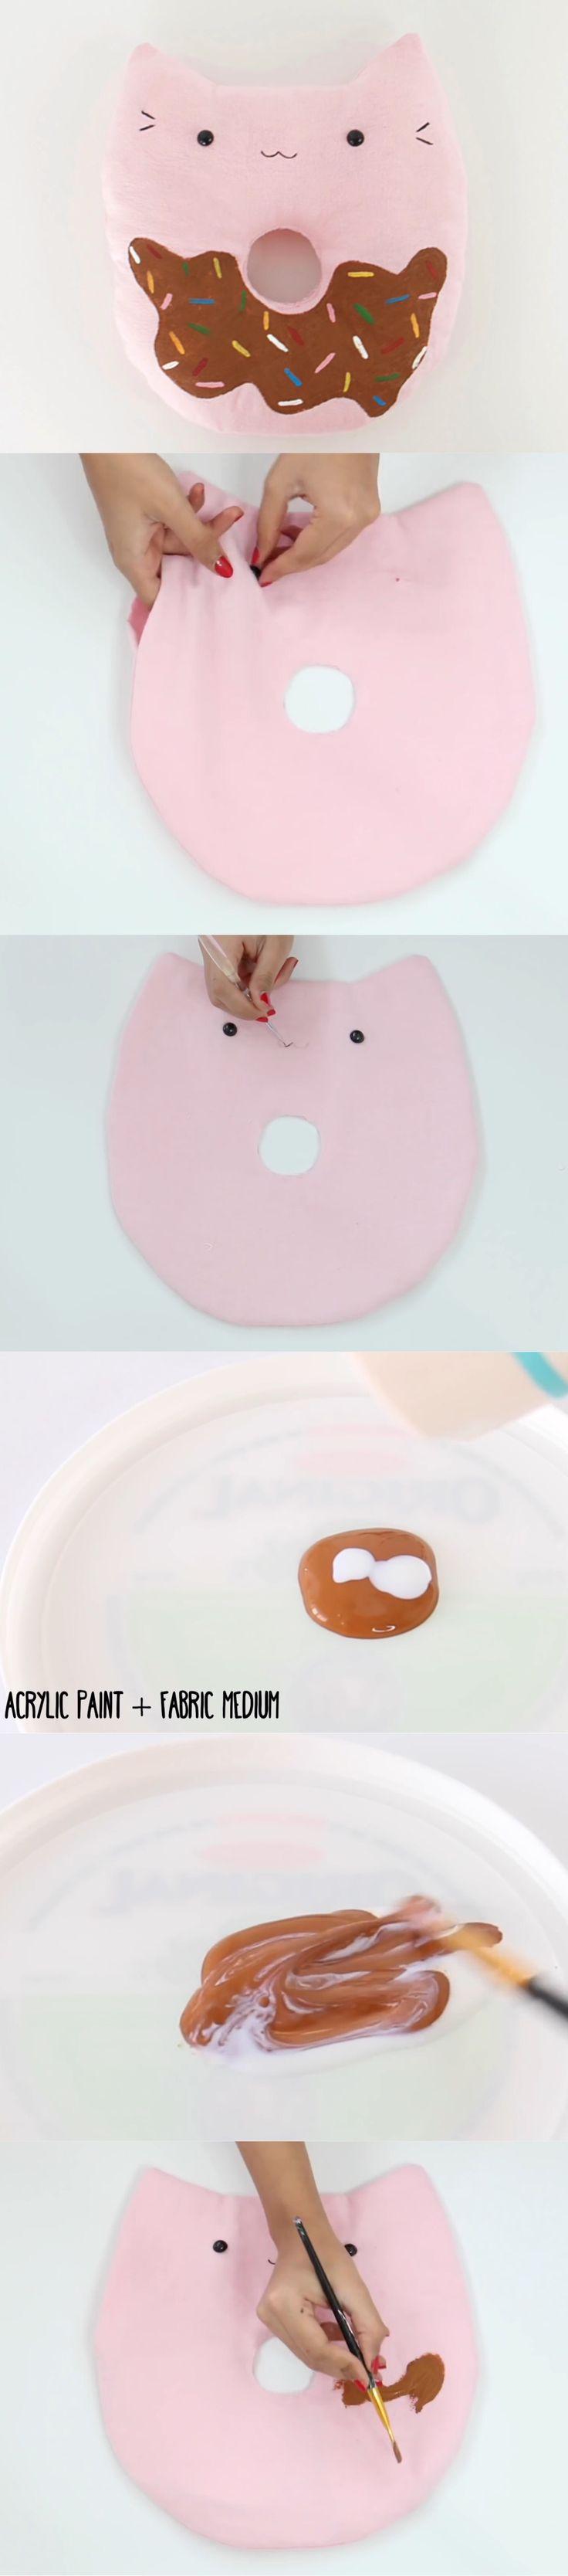 Cat/Donut Pillow Part 3 Nim C